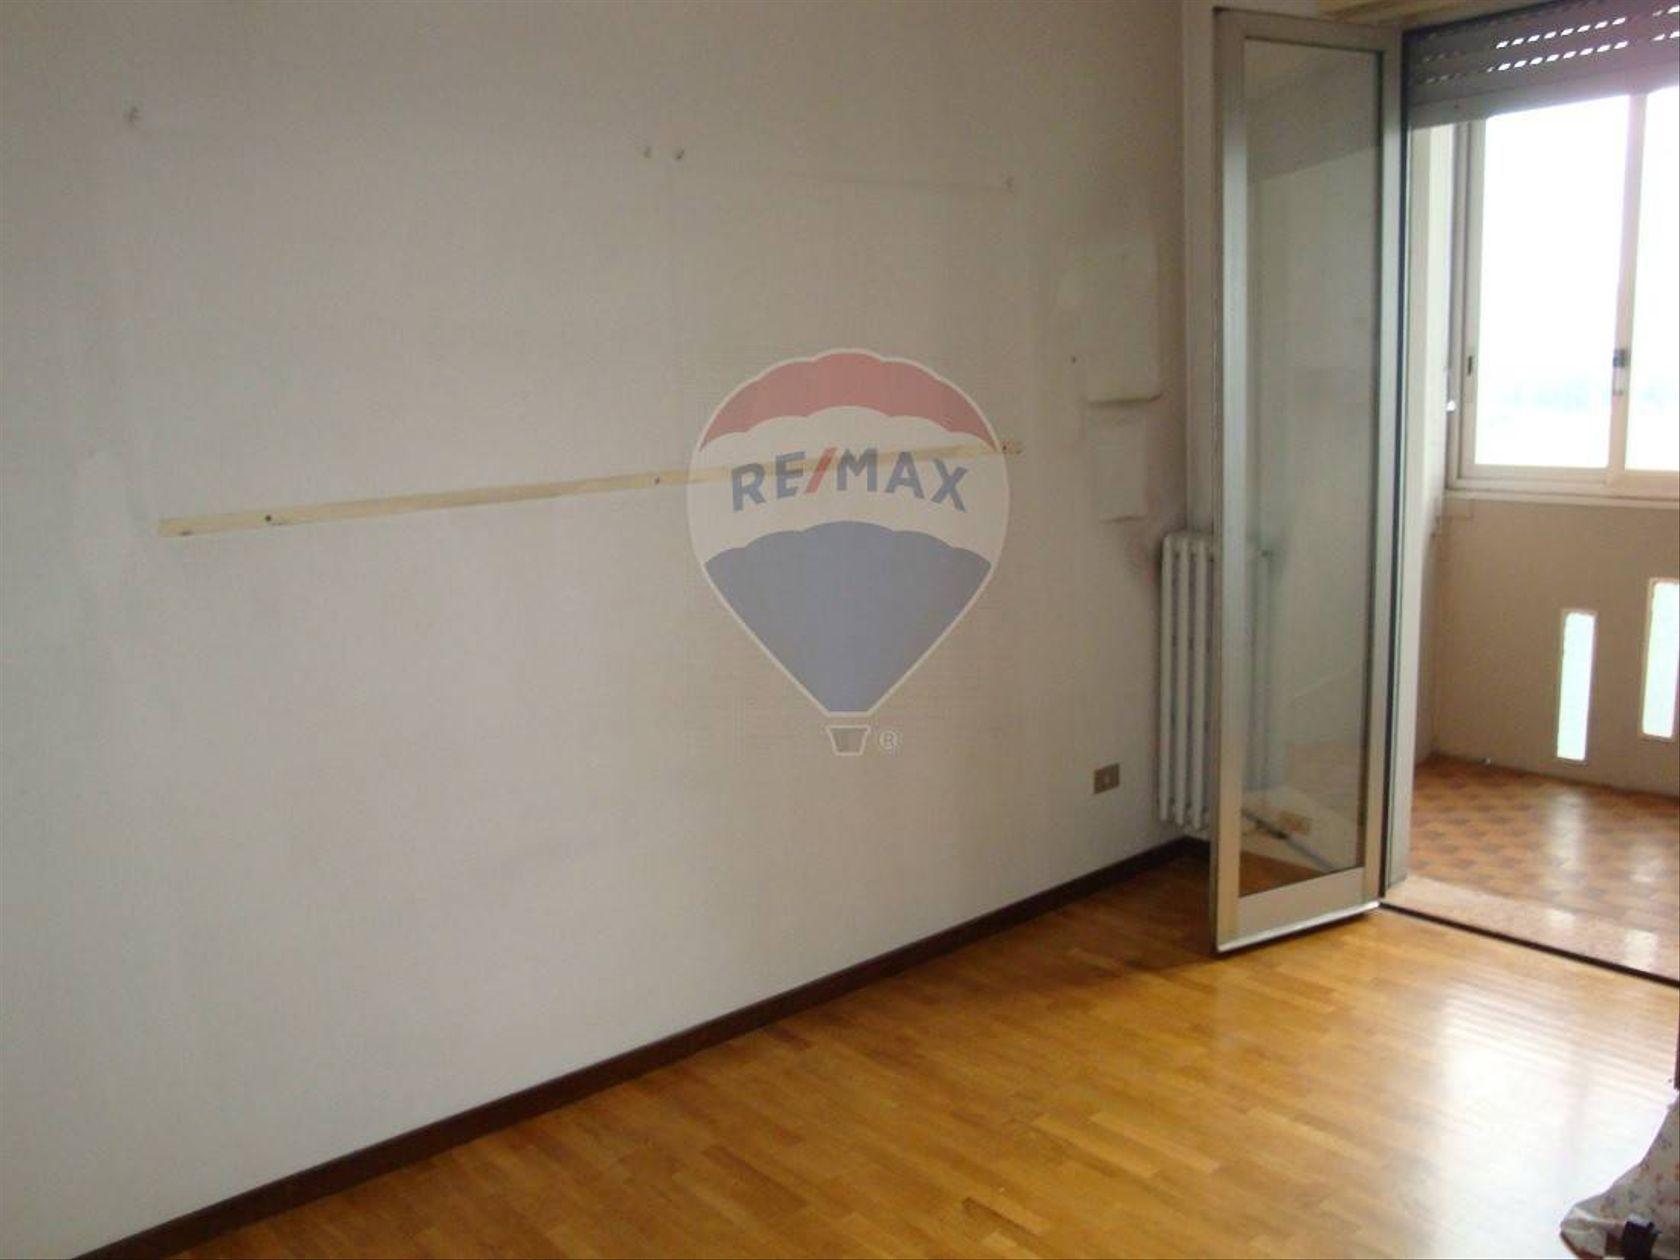 Appartamento Borgo Venezia, Verona, VR Vendita - Foto 20